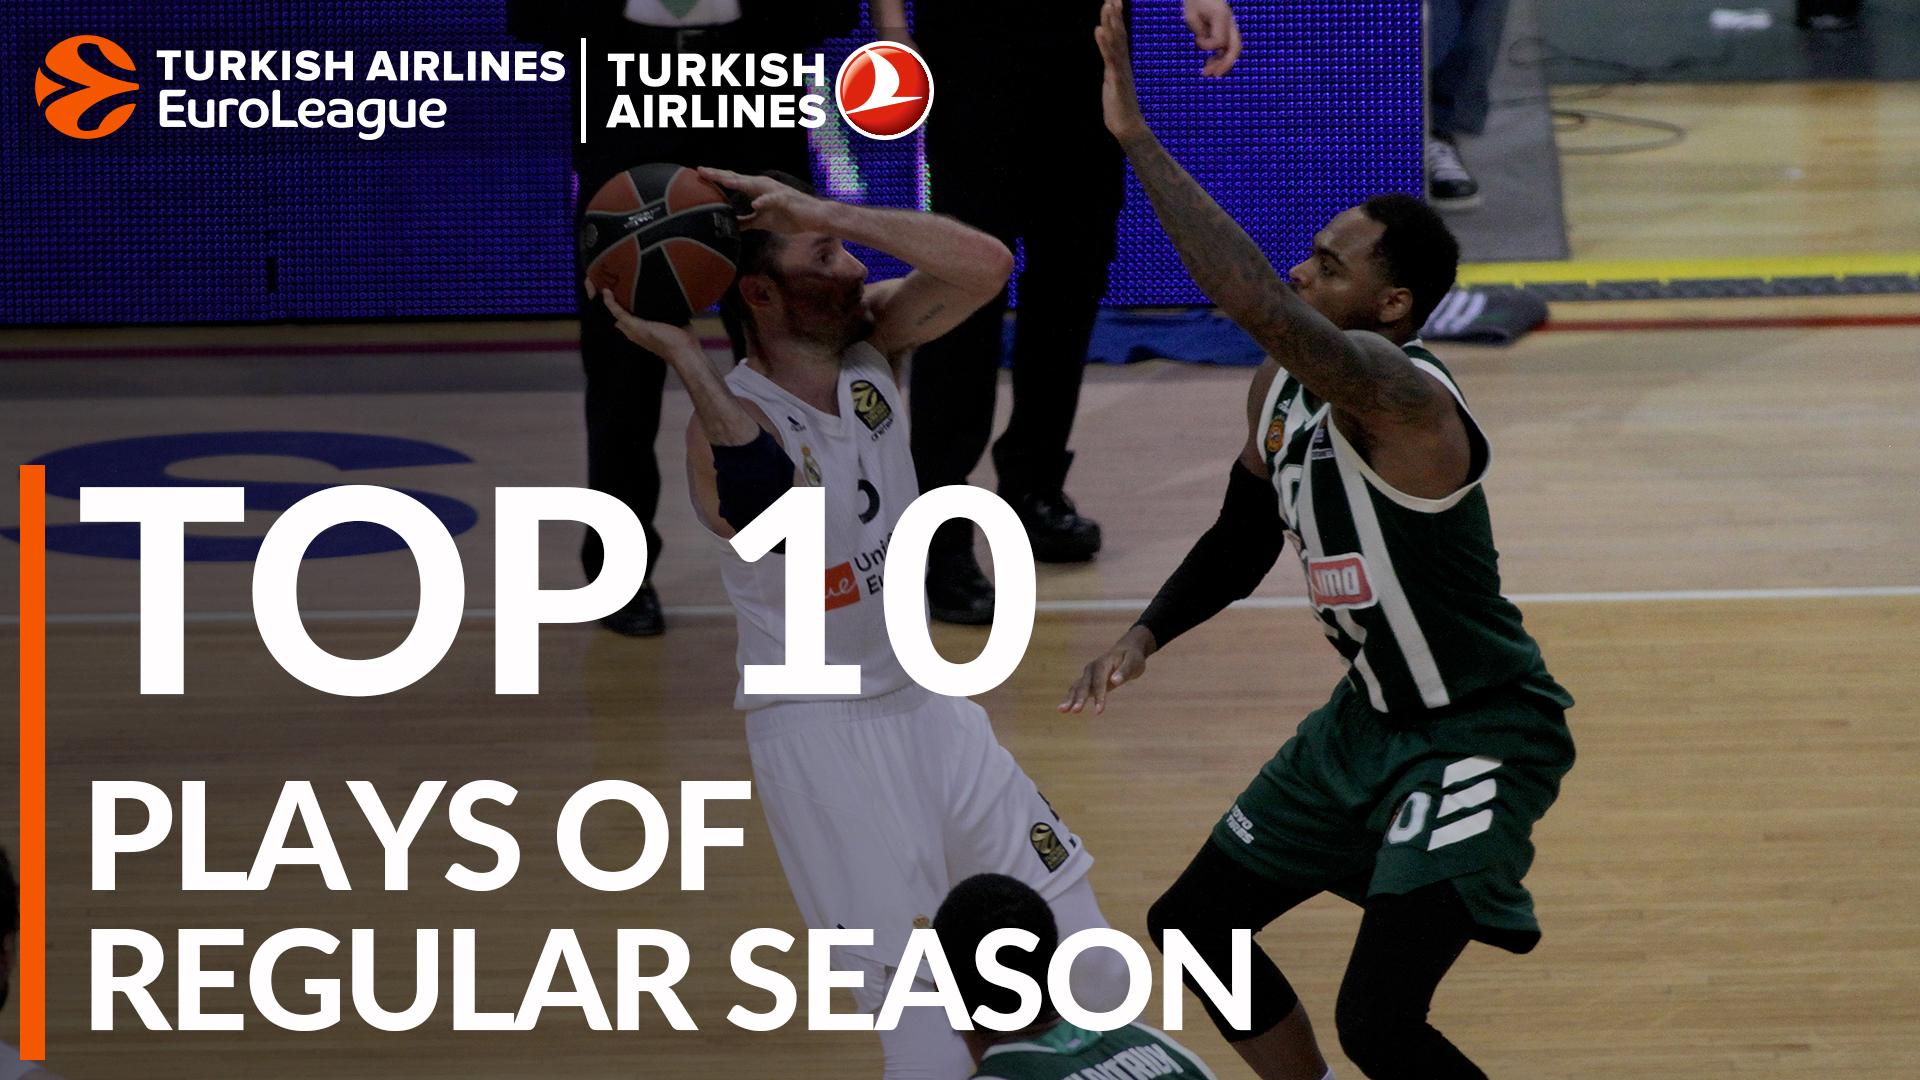 Turkish Airlines EuroLeague, Top 10 Plays of the Regular Season